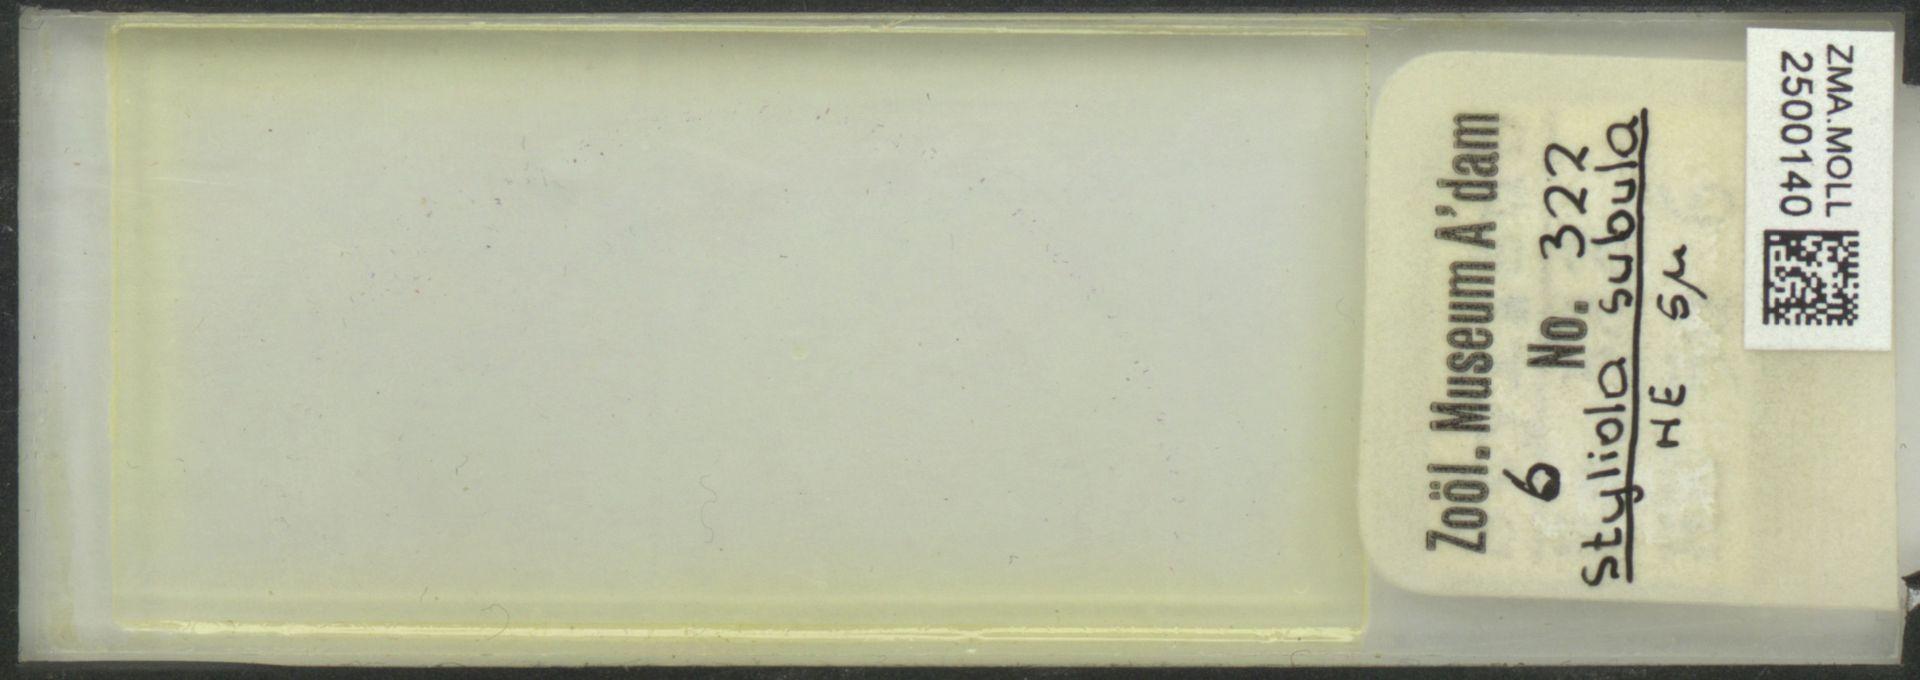 ZMA.MOLL.2500140 | Styliola subula (Quoy & Gaimard, 1827)